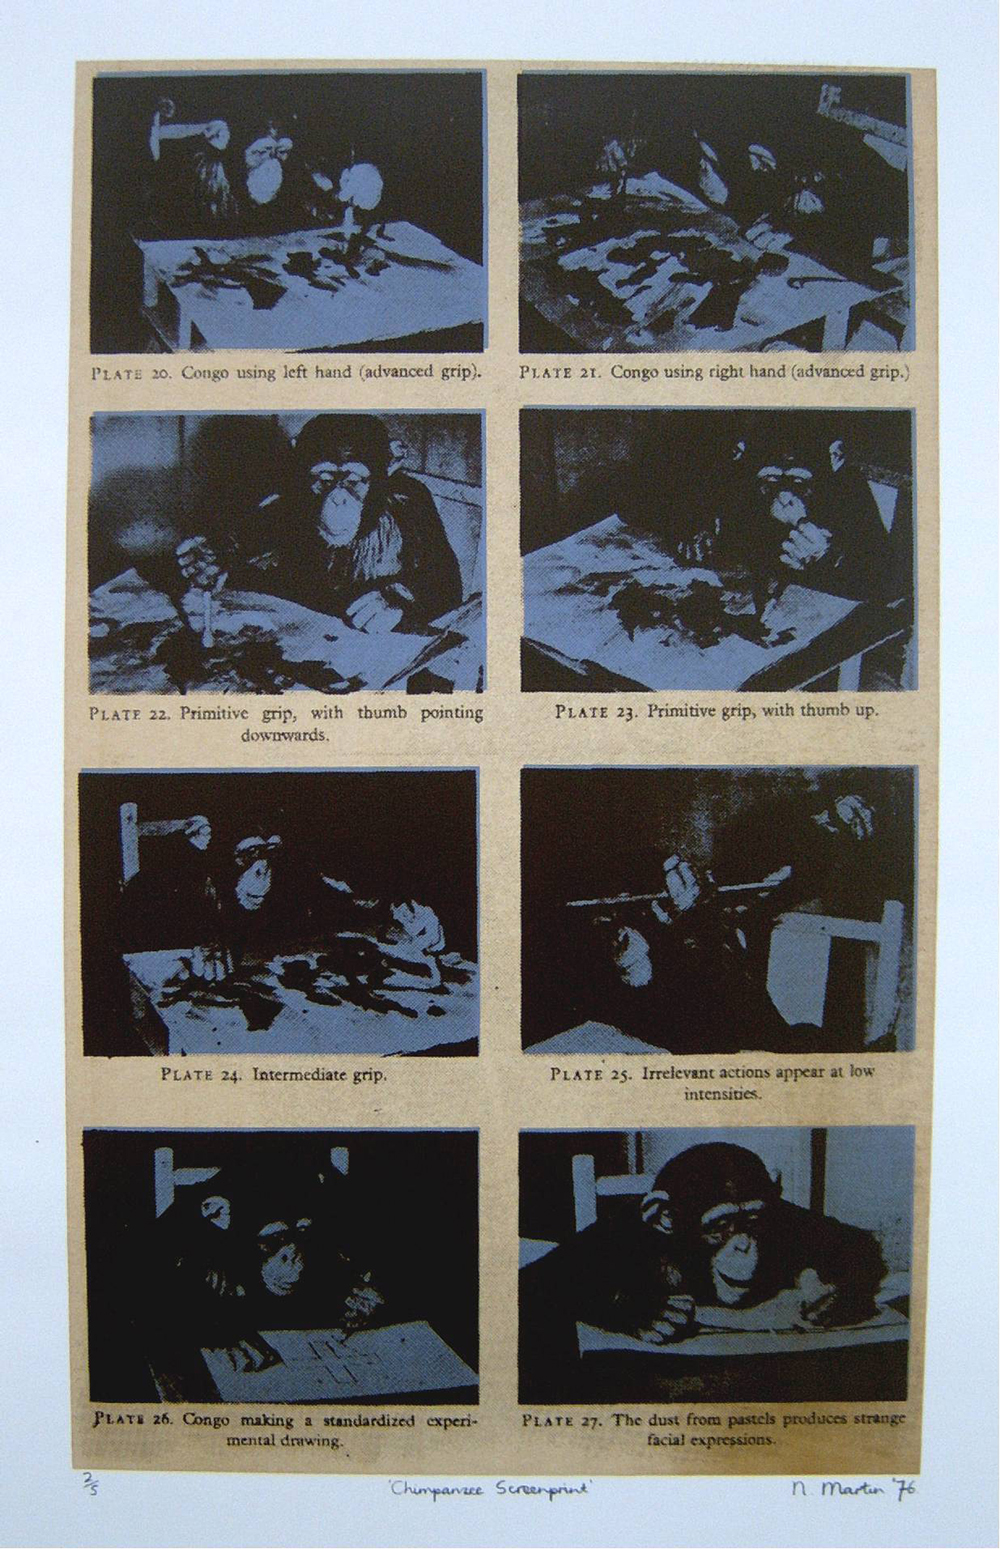 Chimpanzee Screenprint 2 (1st Edition).jpg